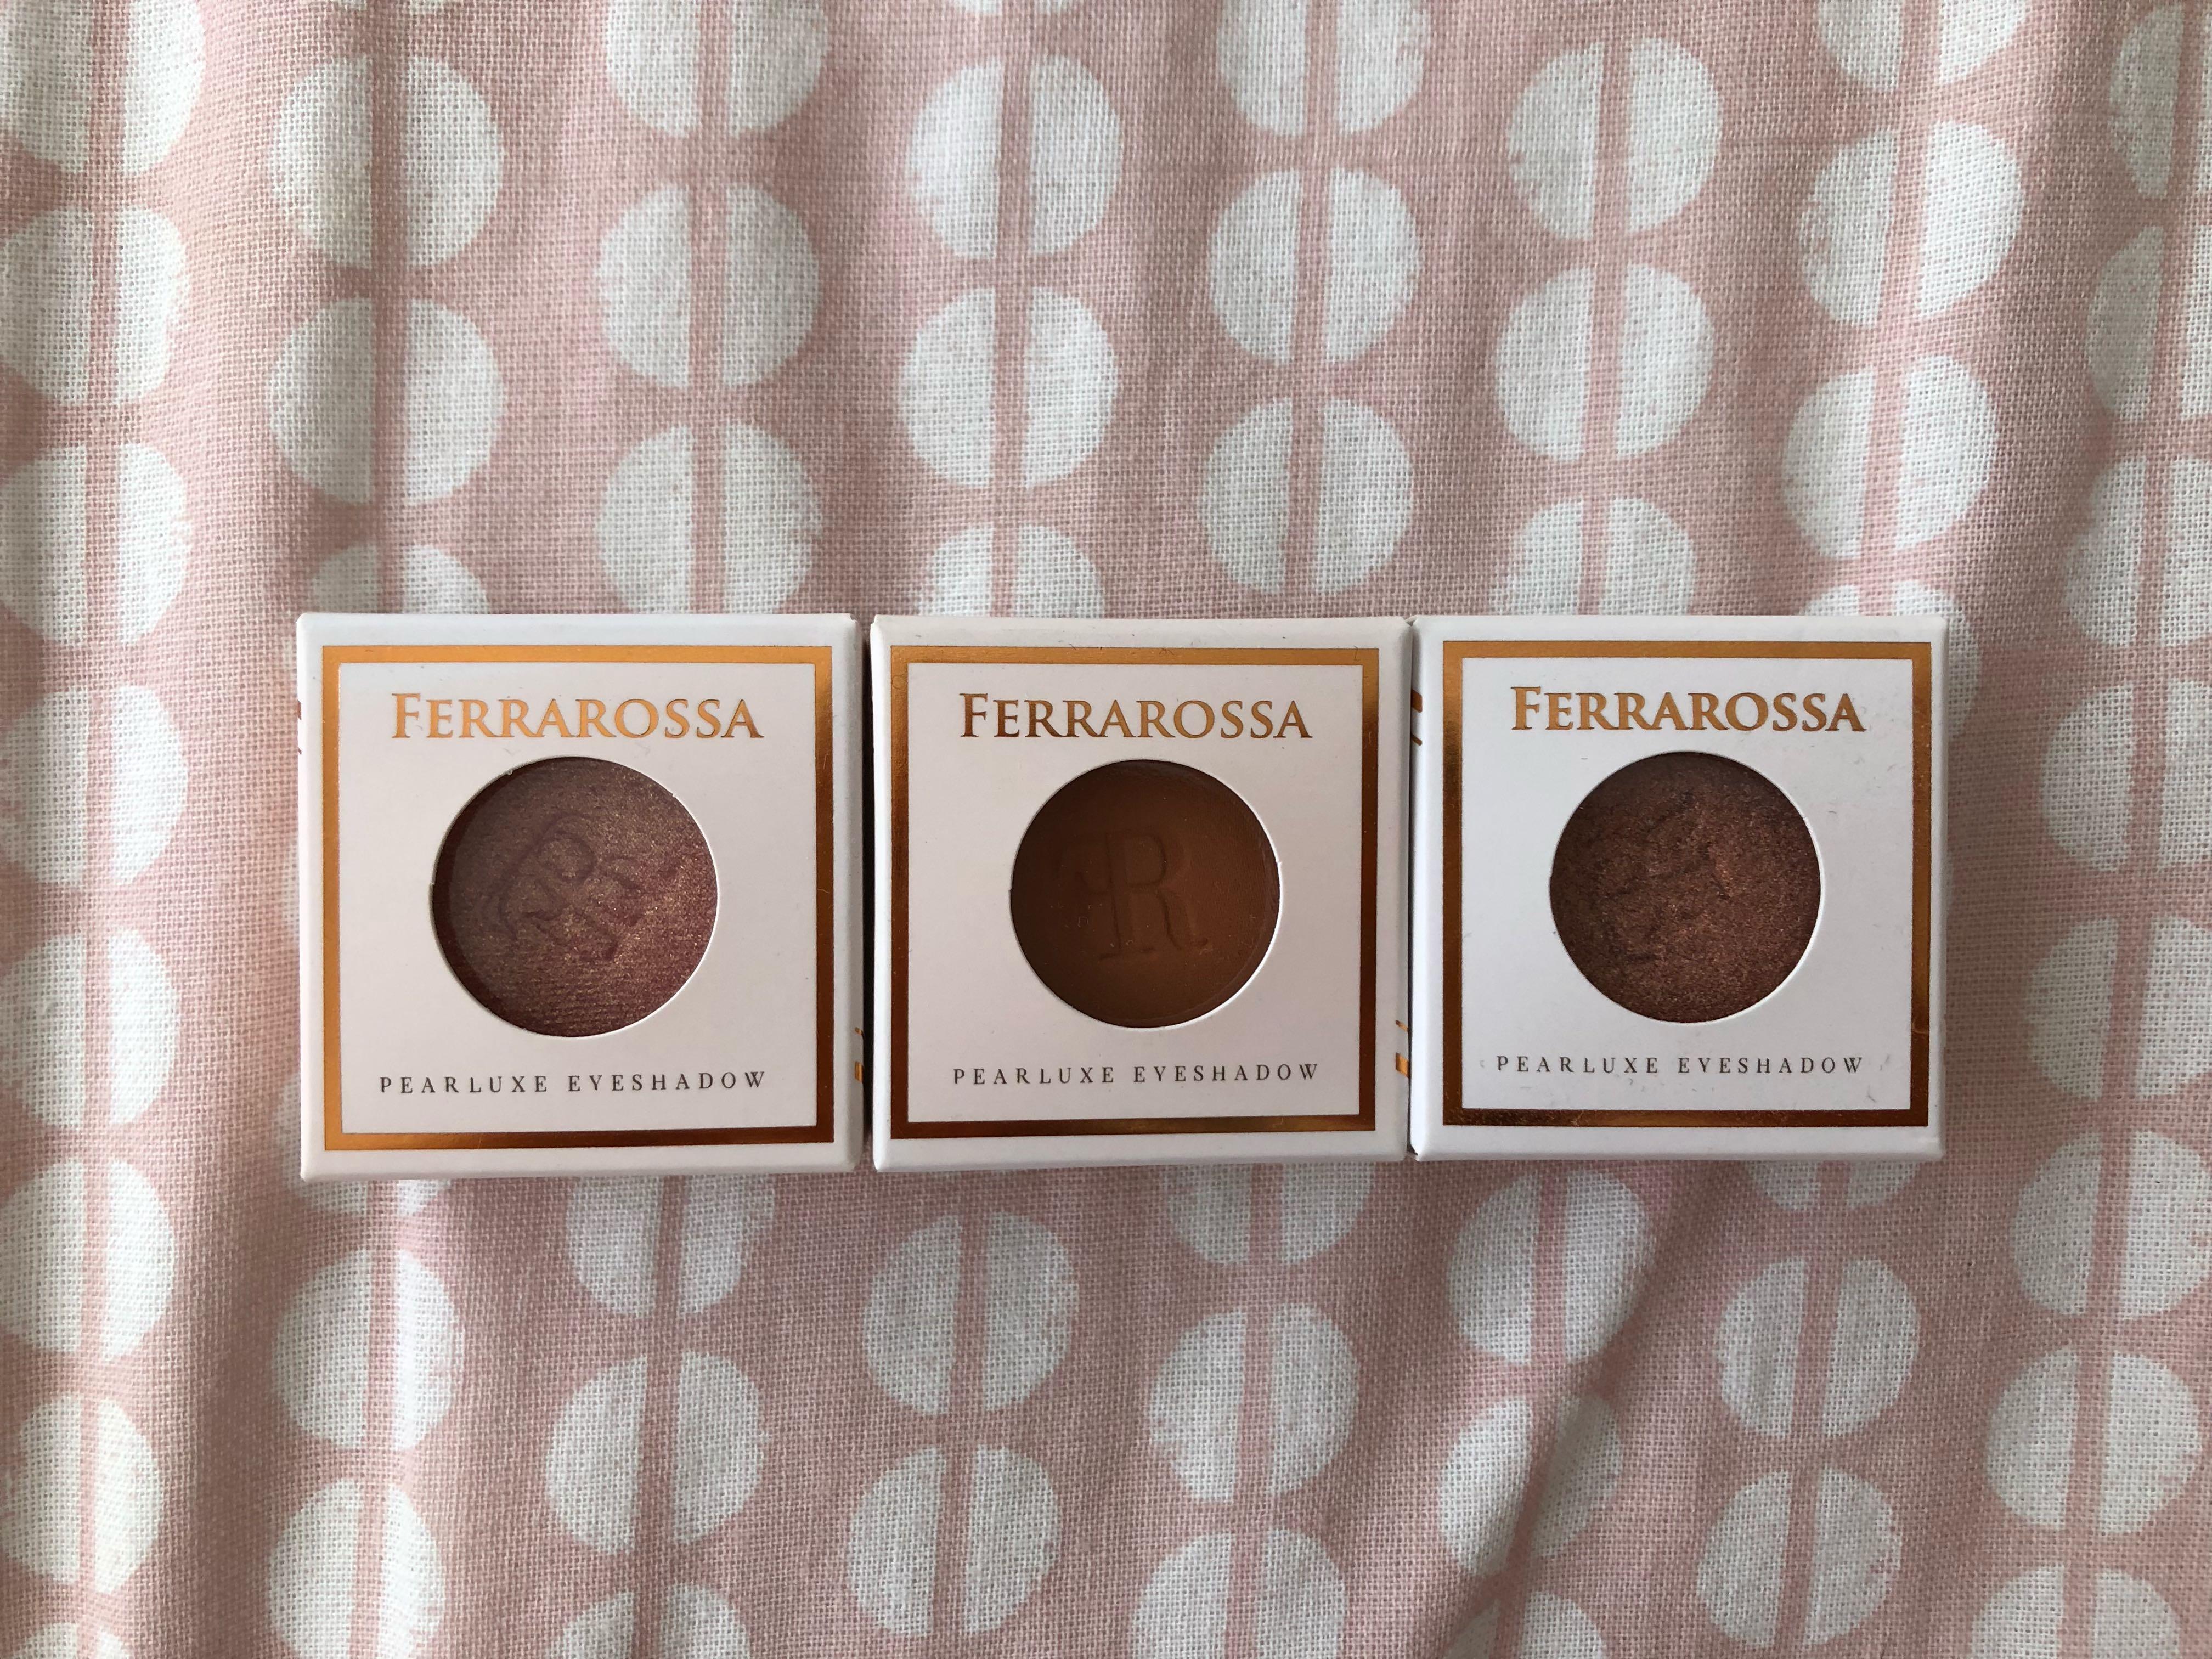 Ferrarossa Pearluxe Eyeshadows Fairytale Collection (3 shade)